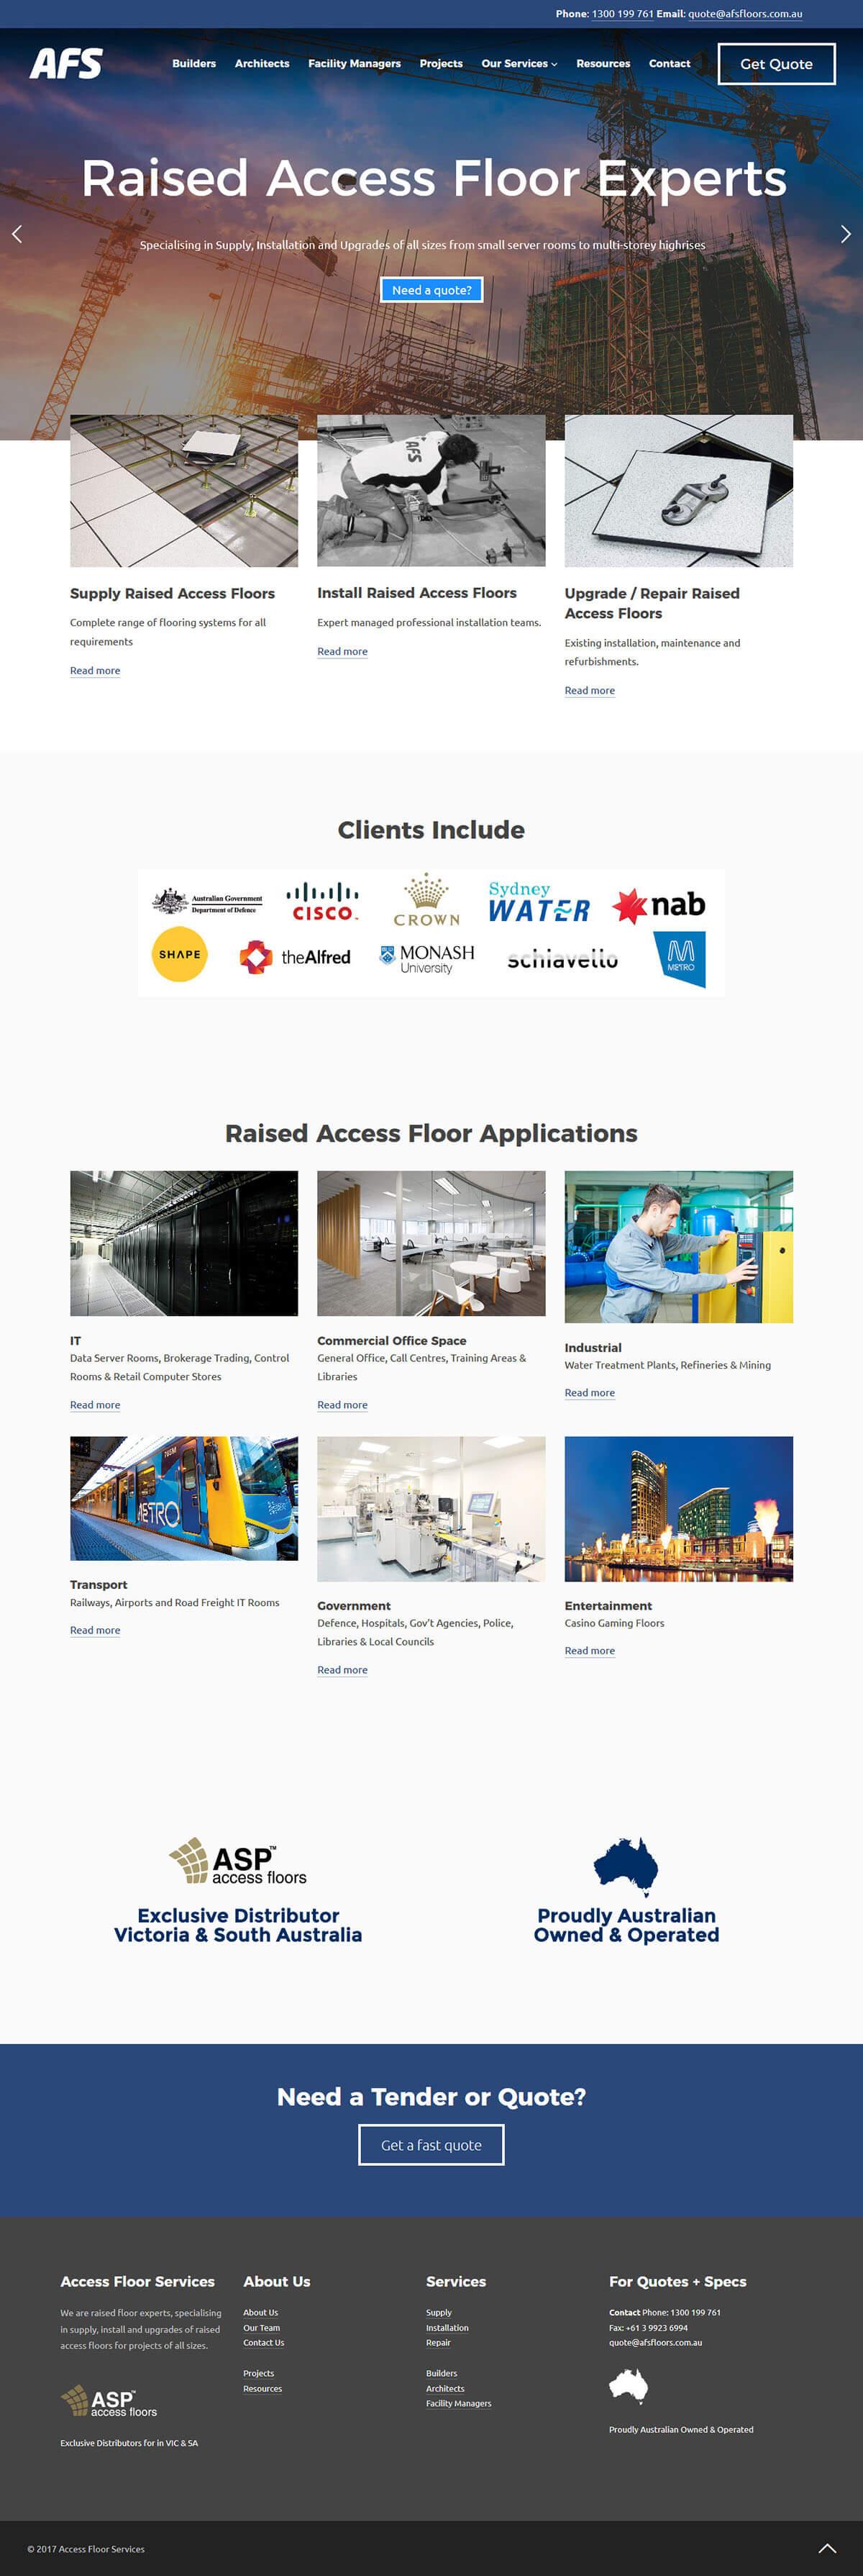 Access Floor Services